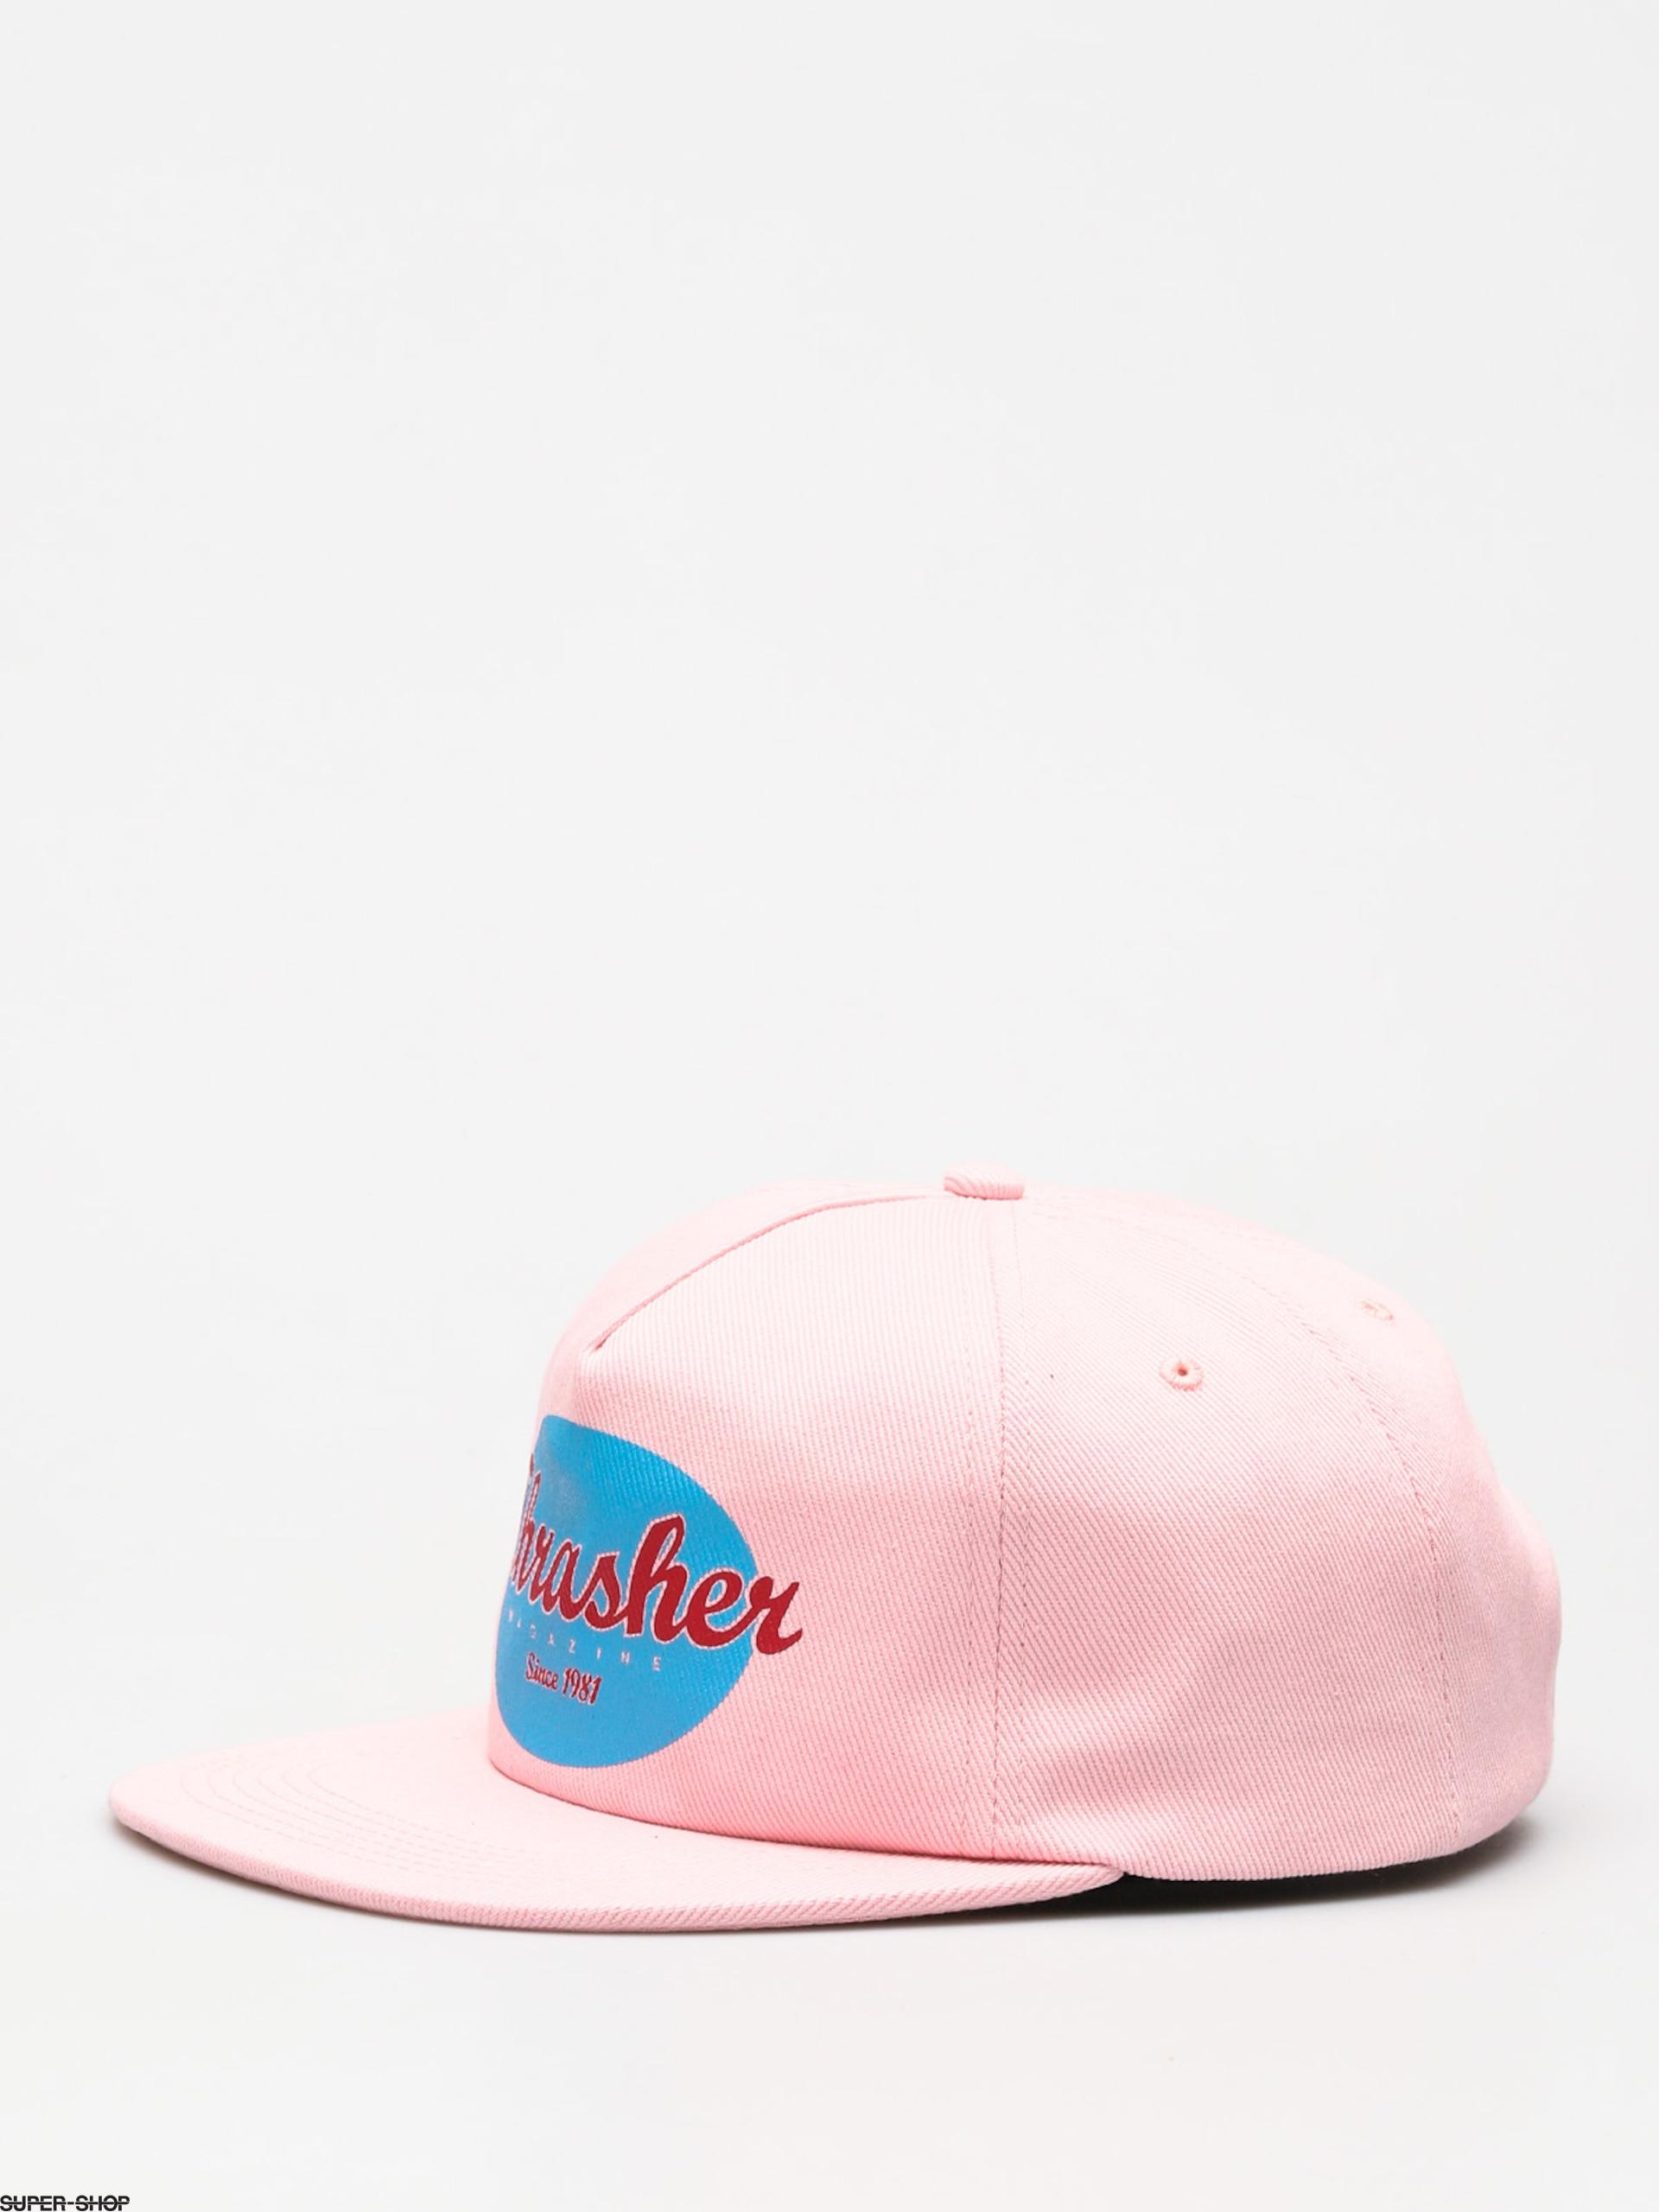 bdbd7c579c5 939448-w1920-thrasher-cap-oval-zd-pink.jpg